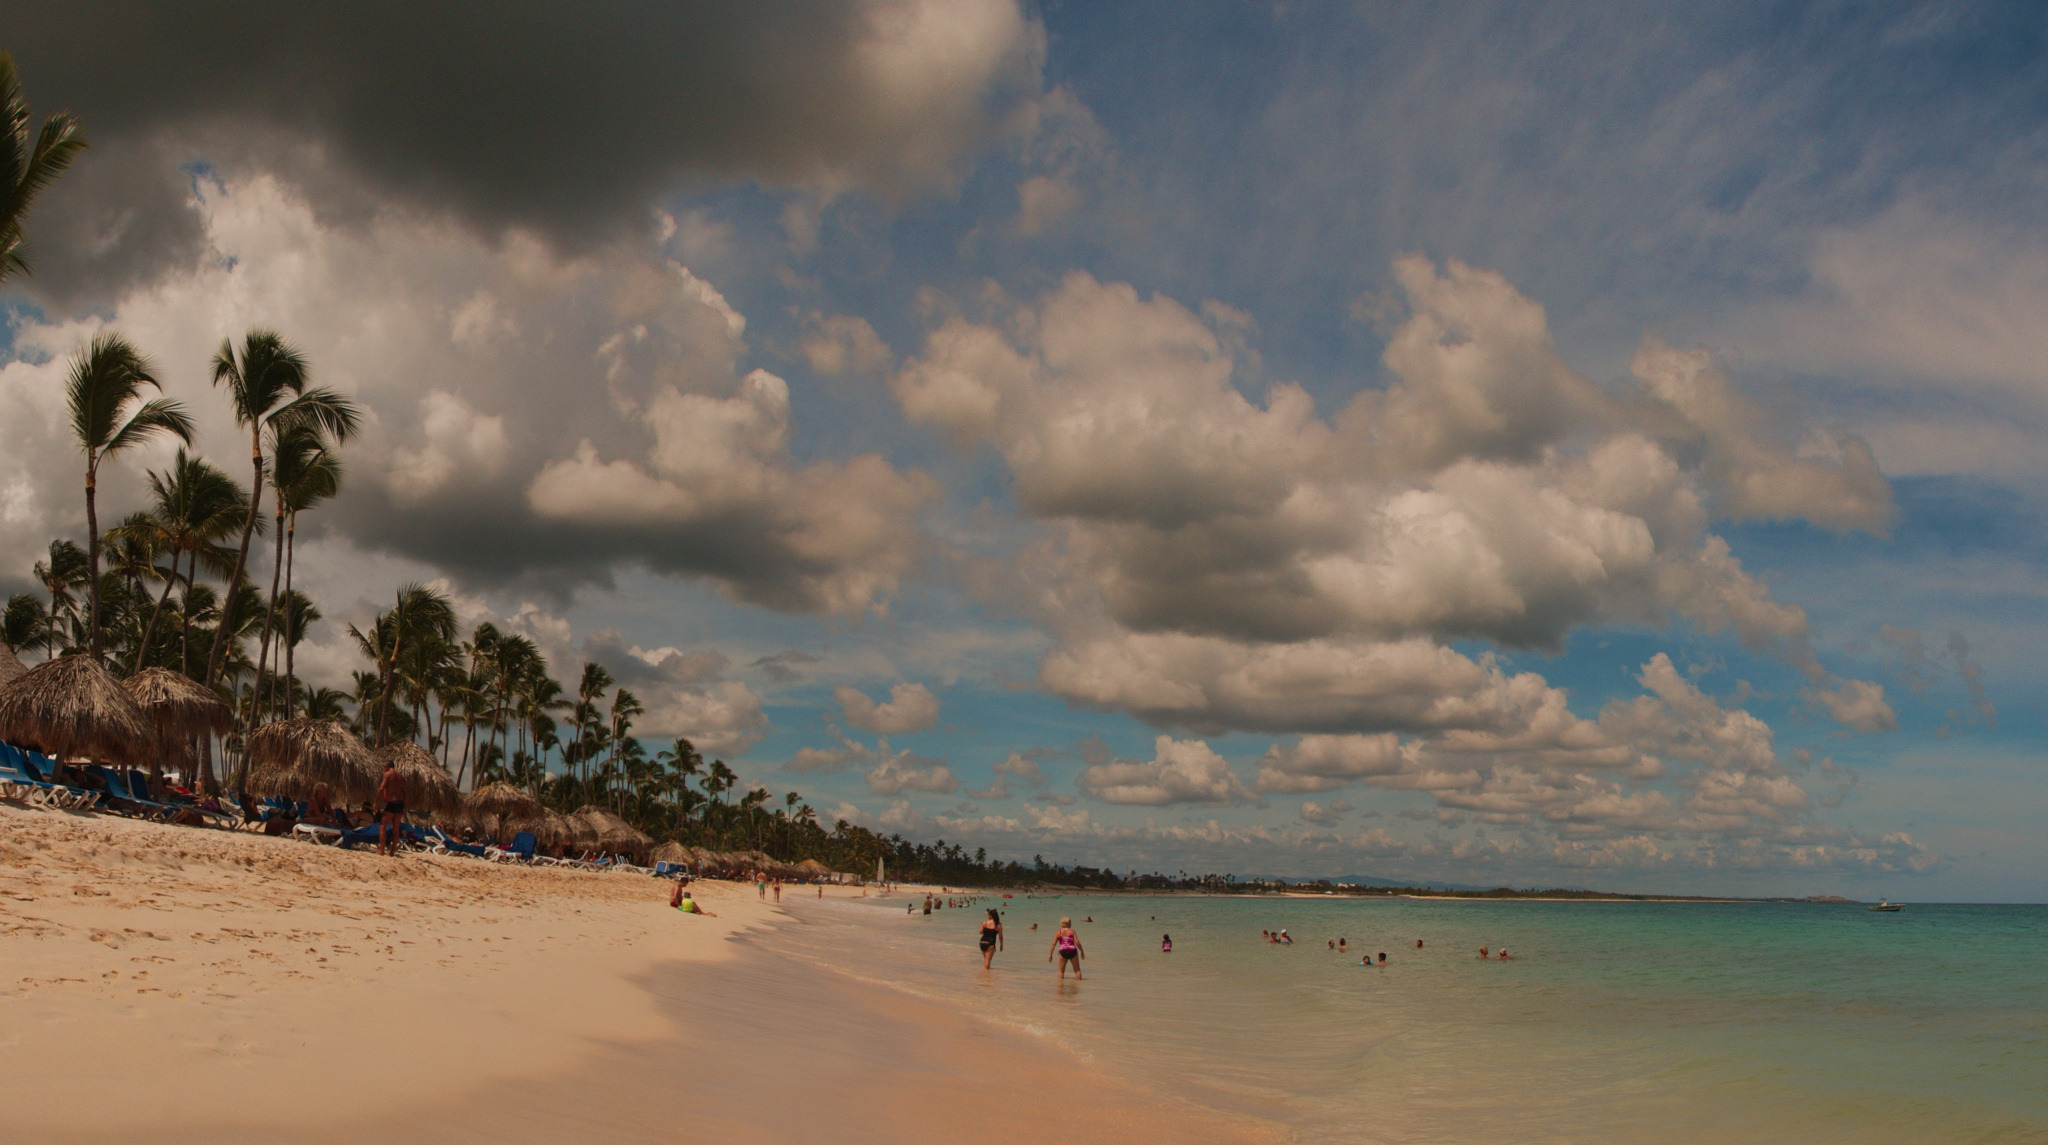 Caribbean beach by ochemodan